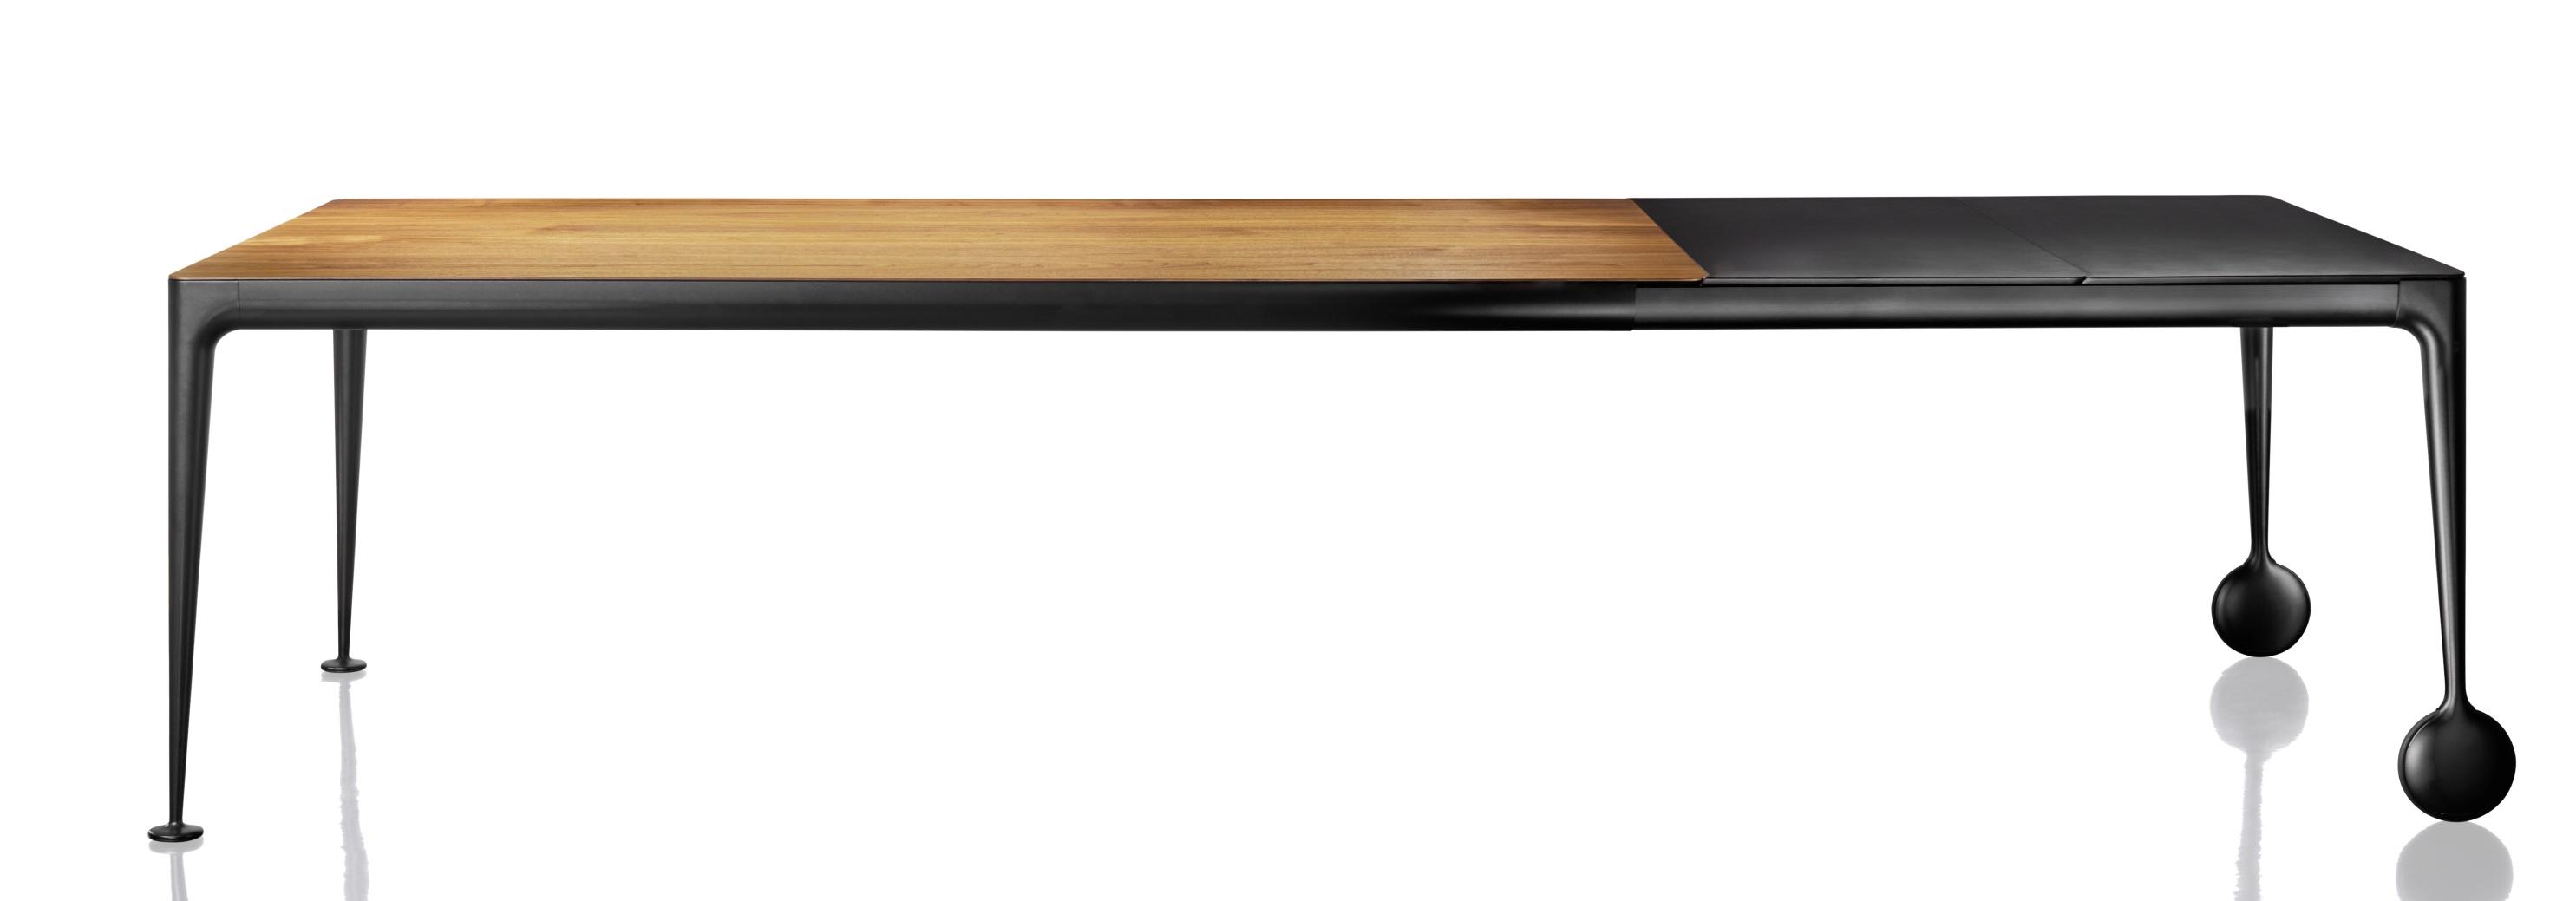 Big Will Table Tisch Rollbar Magis